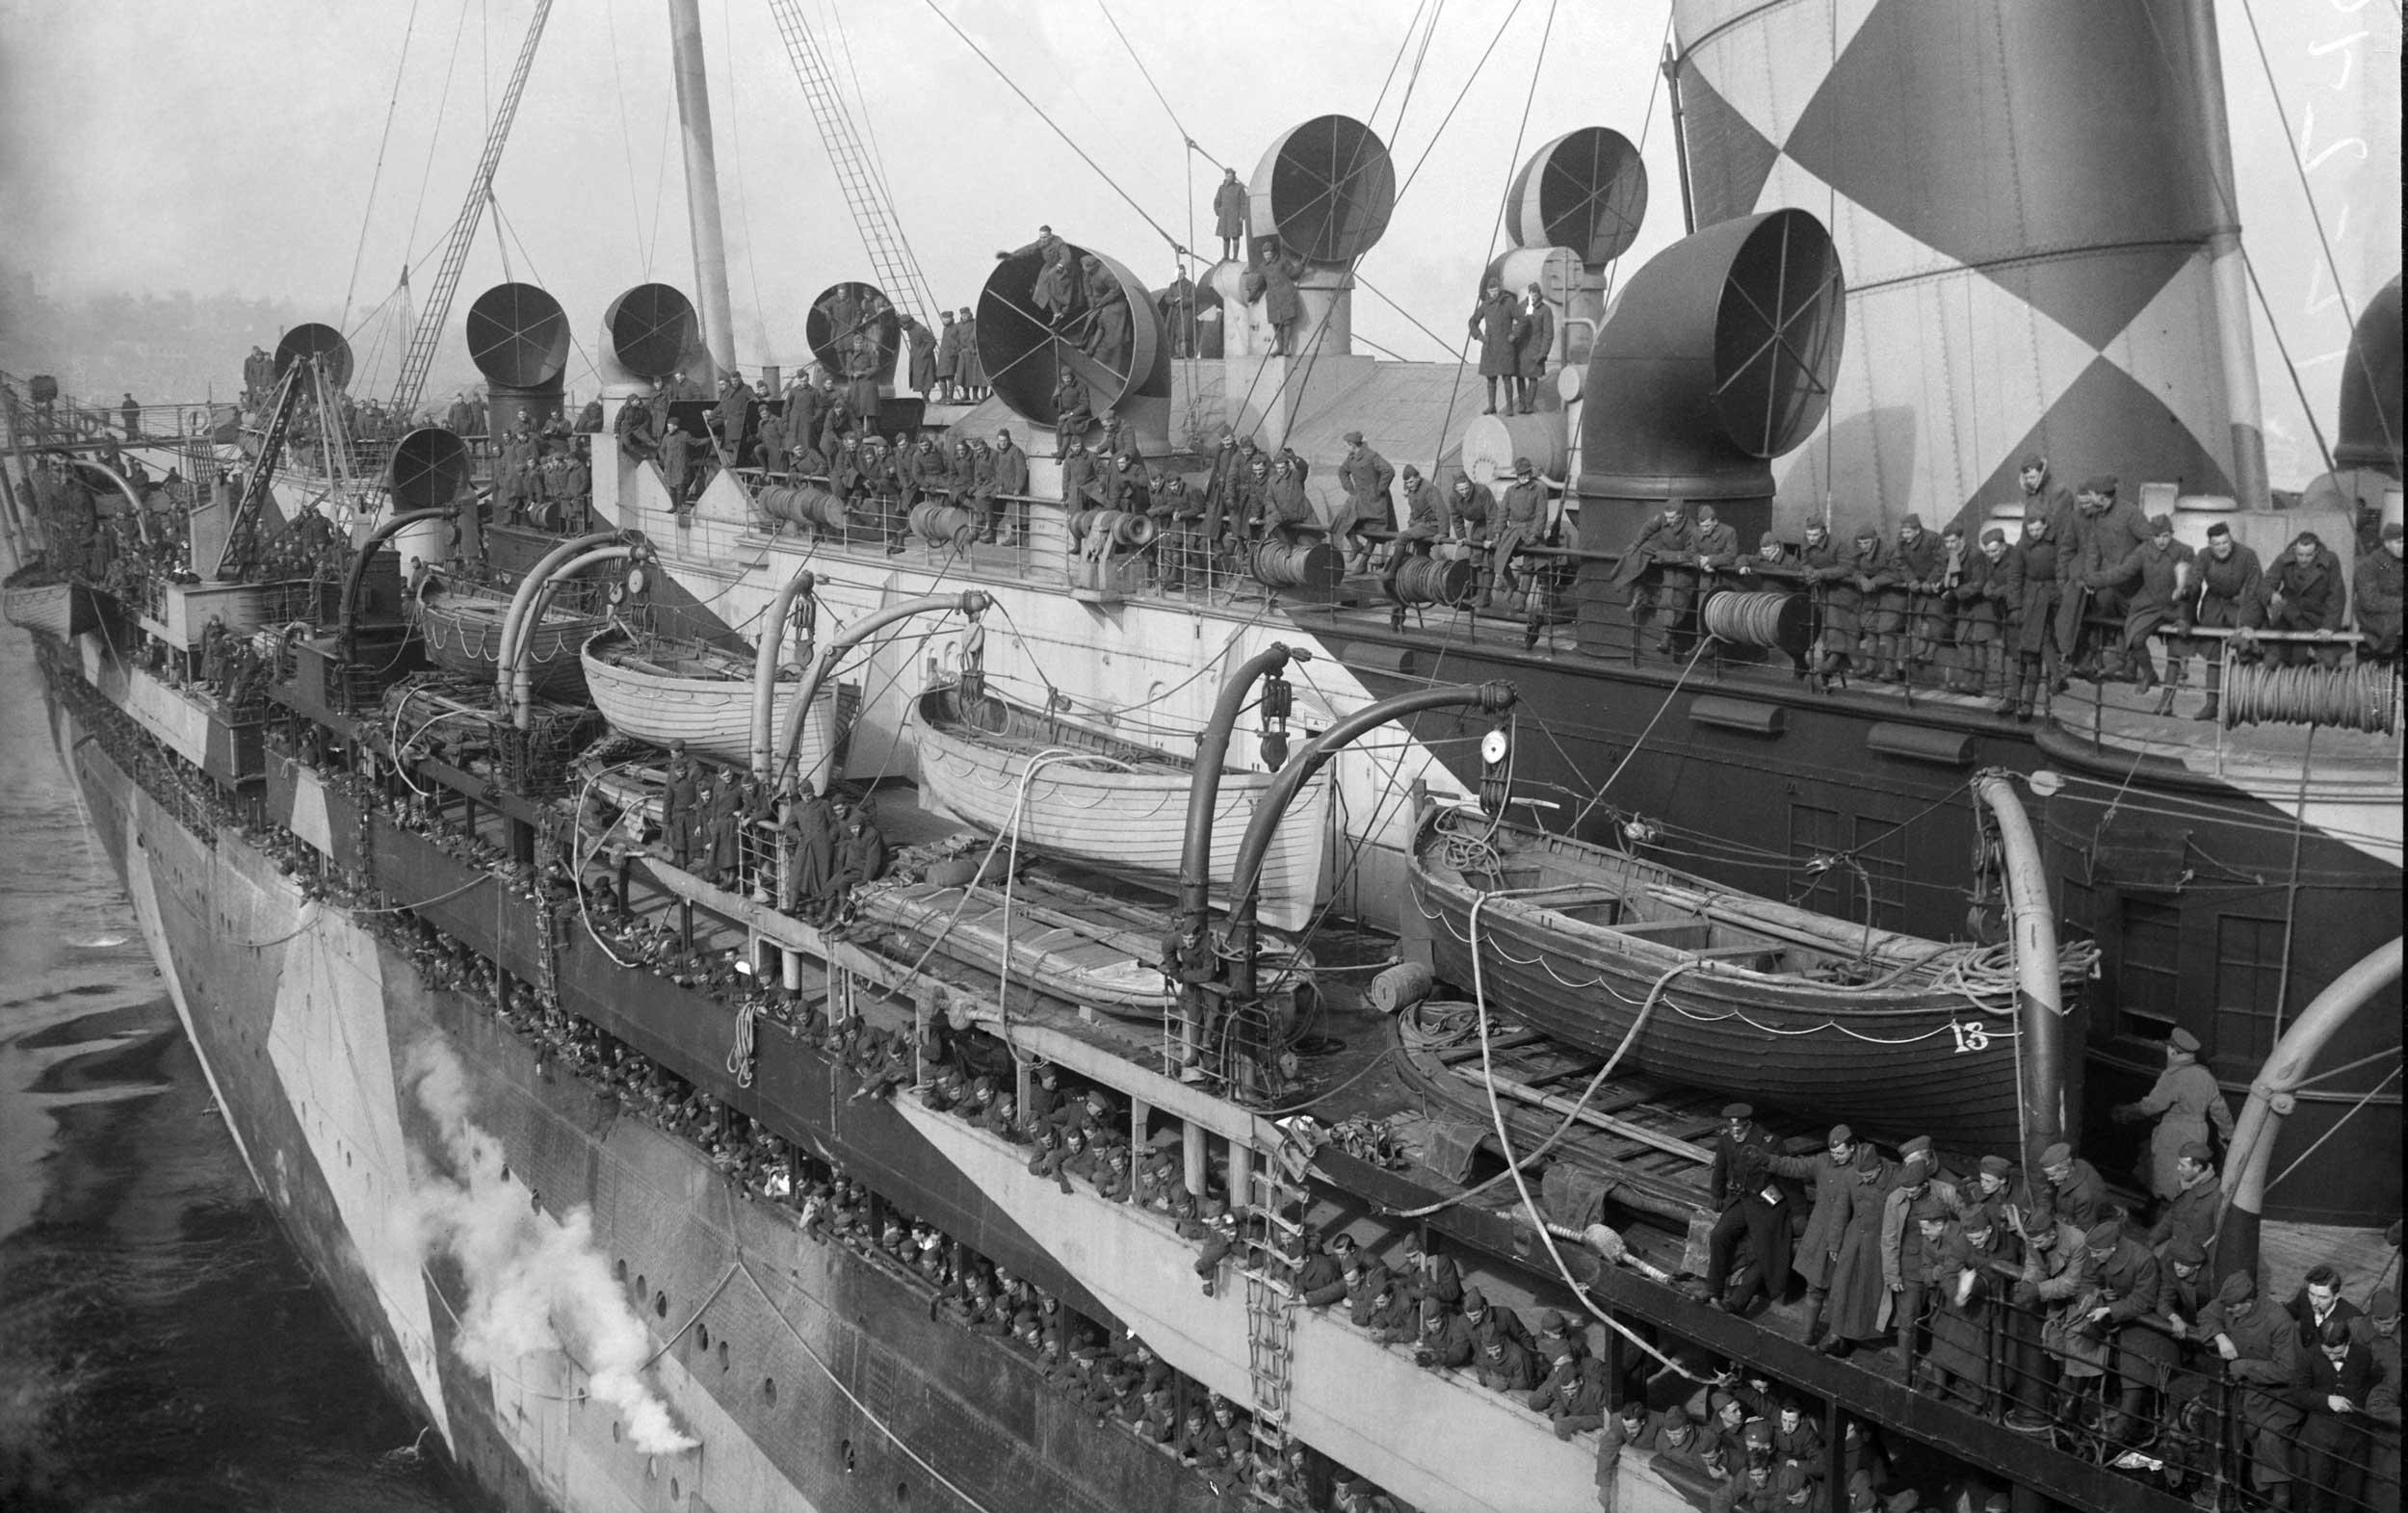 dazzle-ship-mauretania-7.jpg